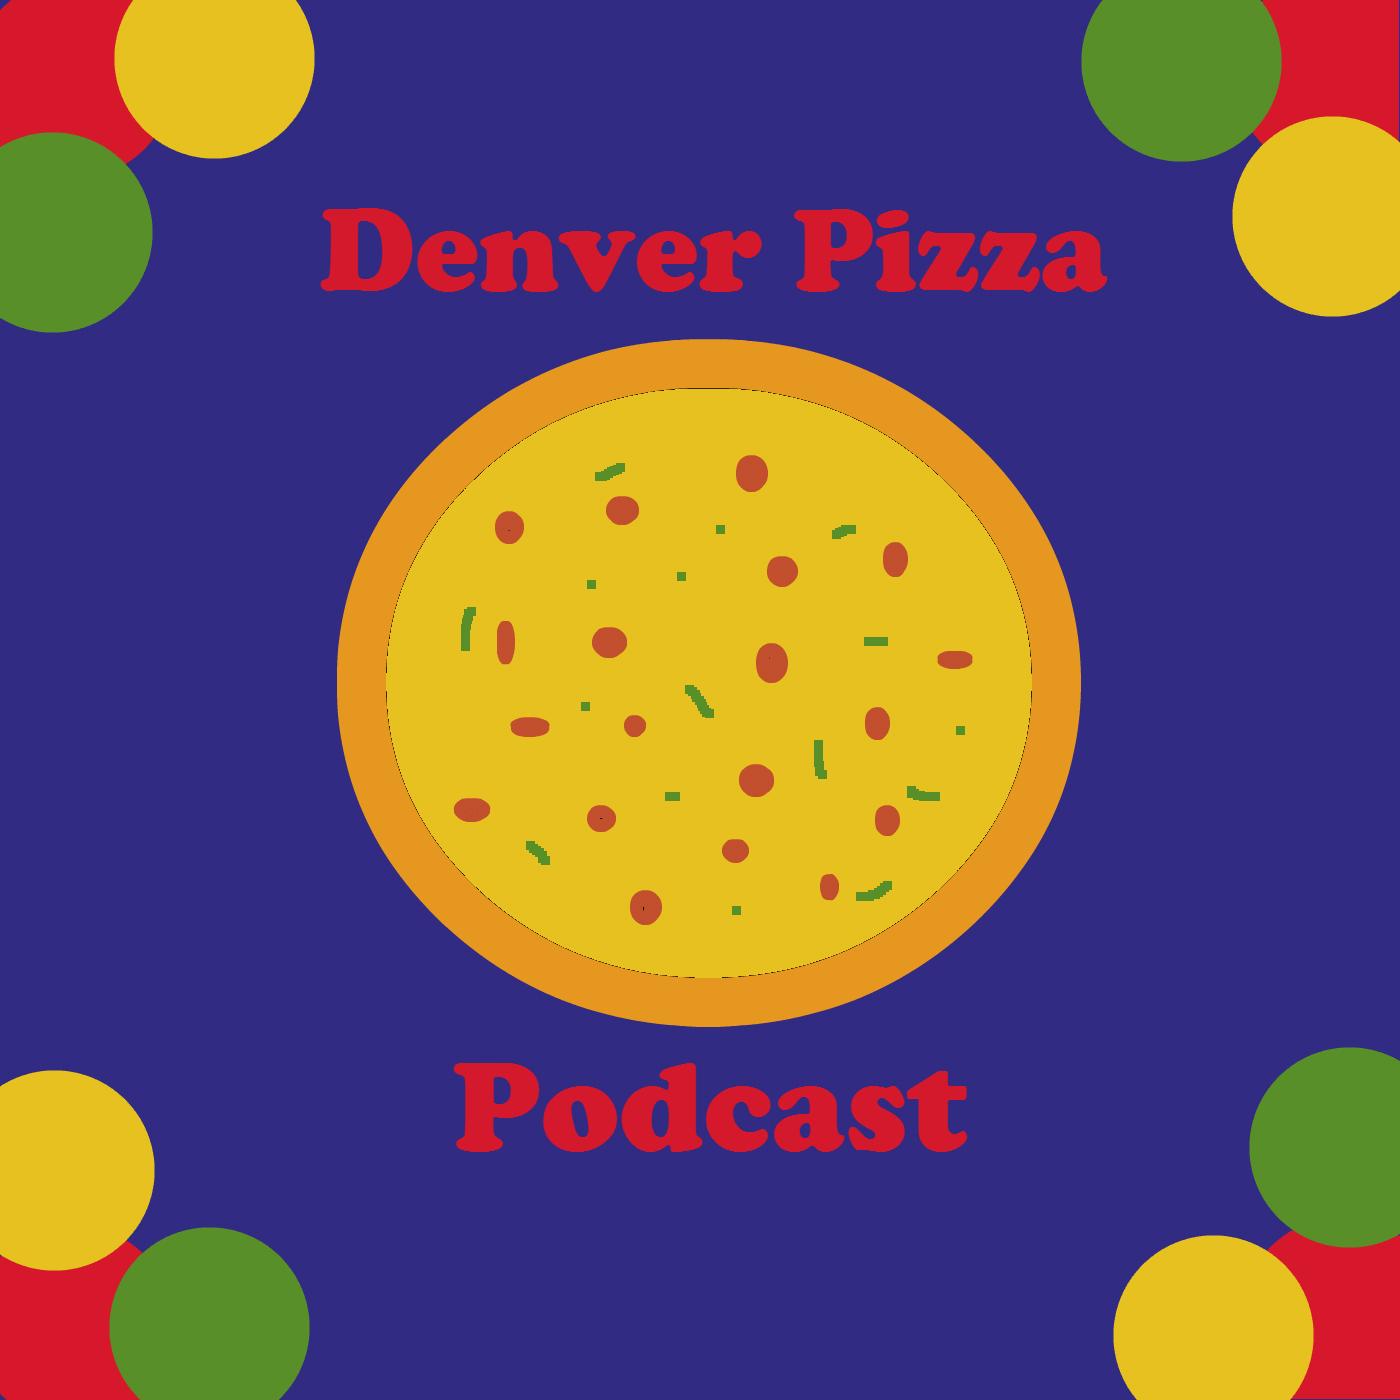 The Denver Pizza Podcast